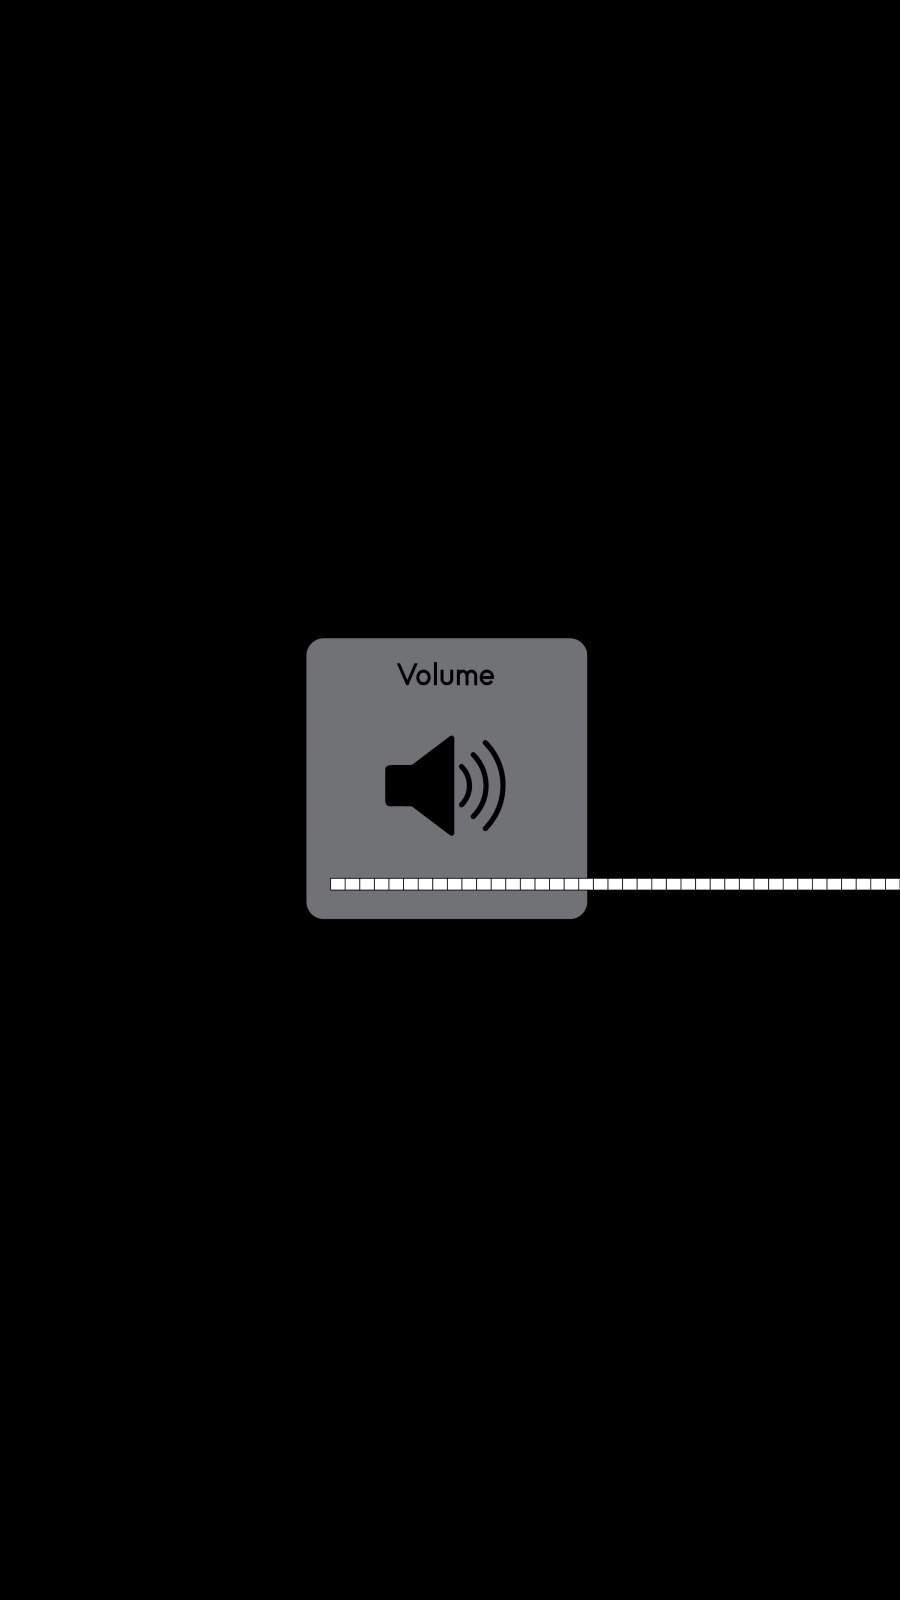 Full Volume iPhone Wallpaper